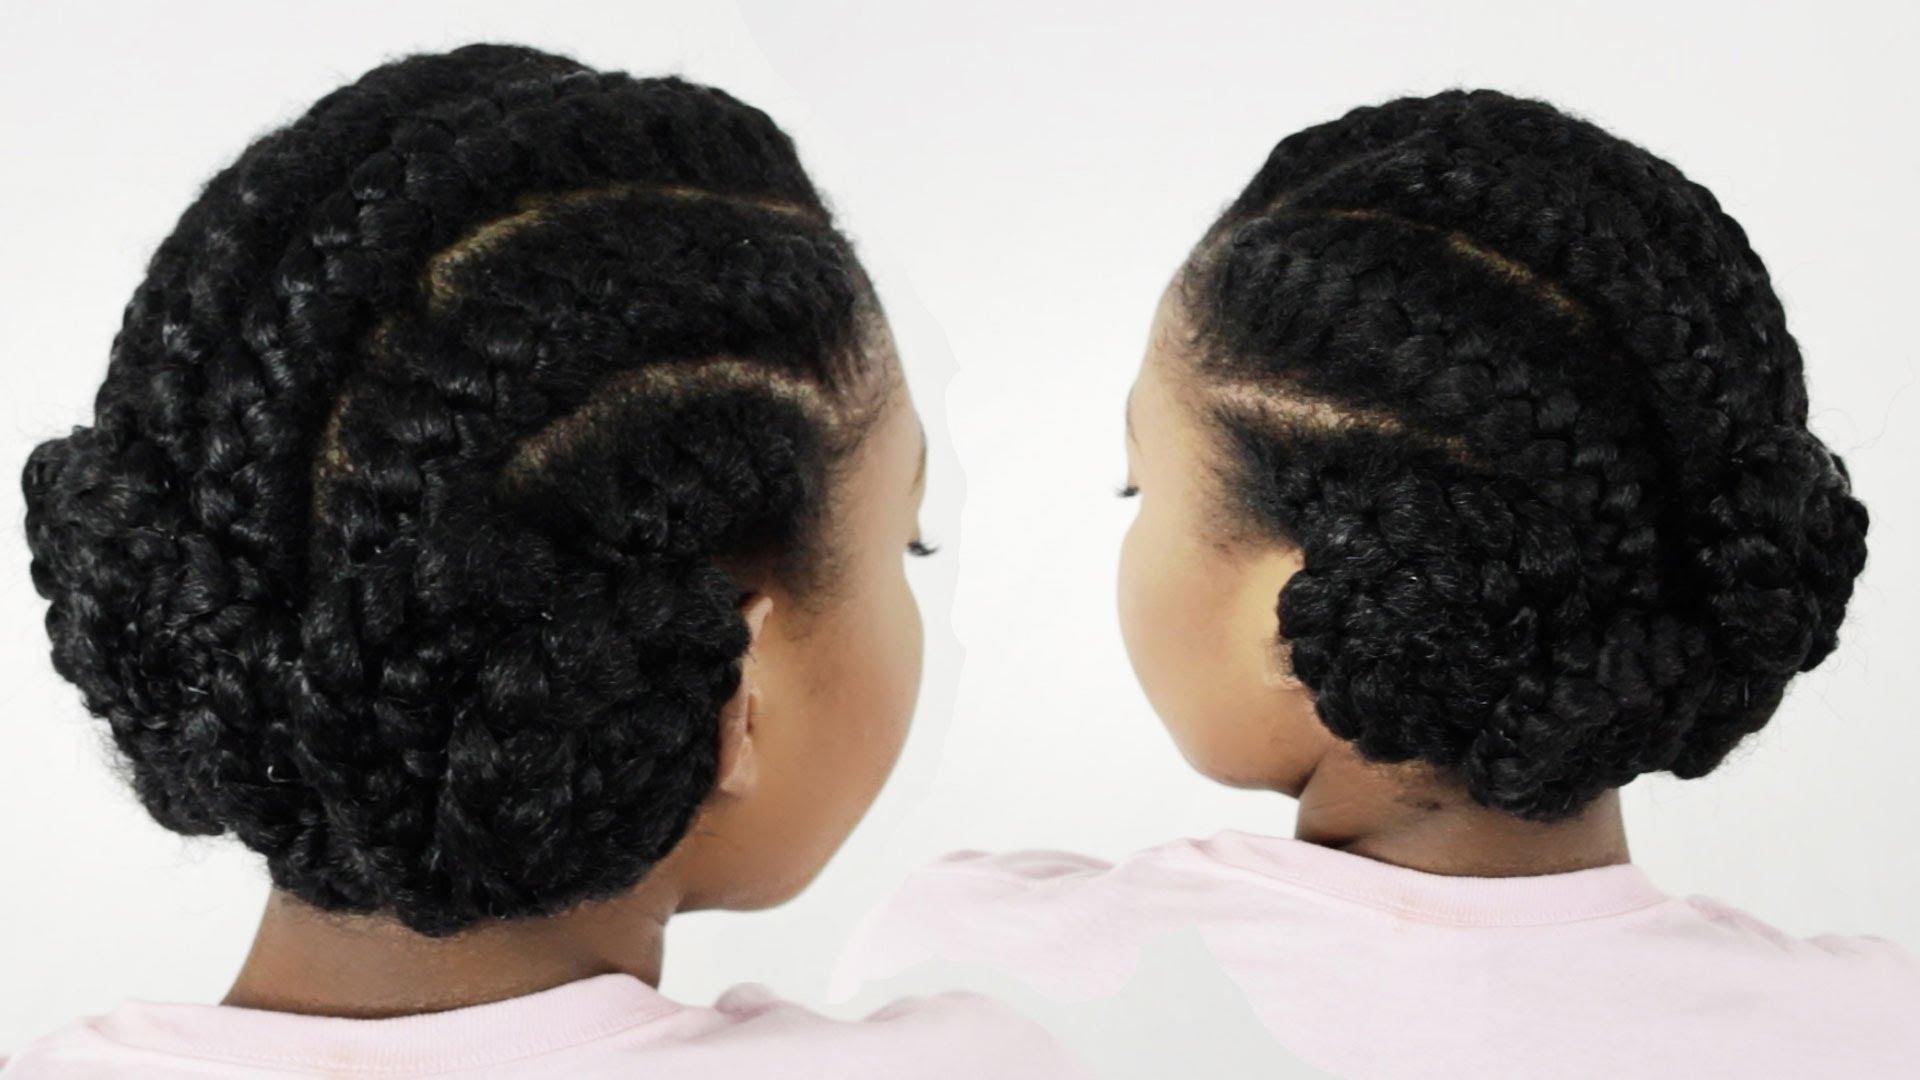 2018 Ghana Braids Bun Hairstyles Within Goddess Braids Pinwheel Bun: Under Braid Hairstyles For Black Women (View 2 of 15)